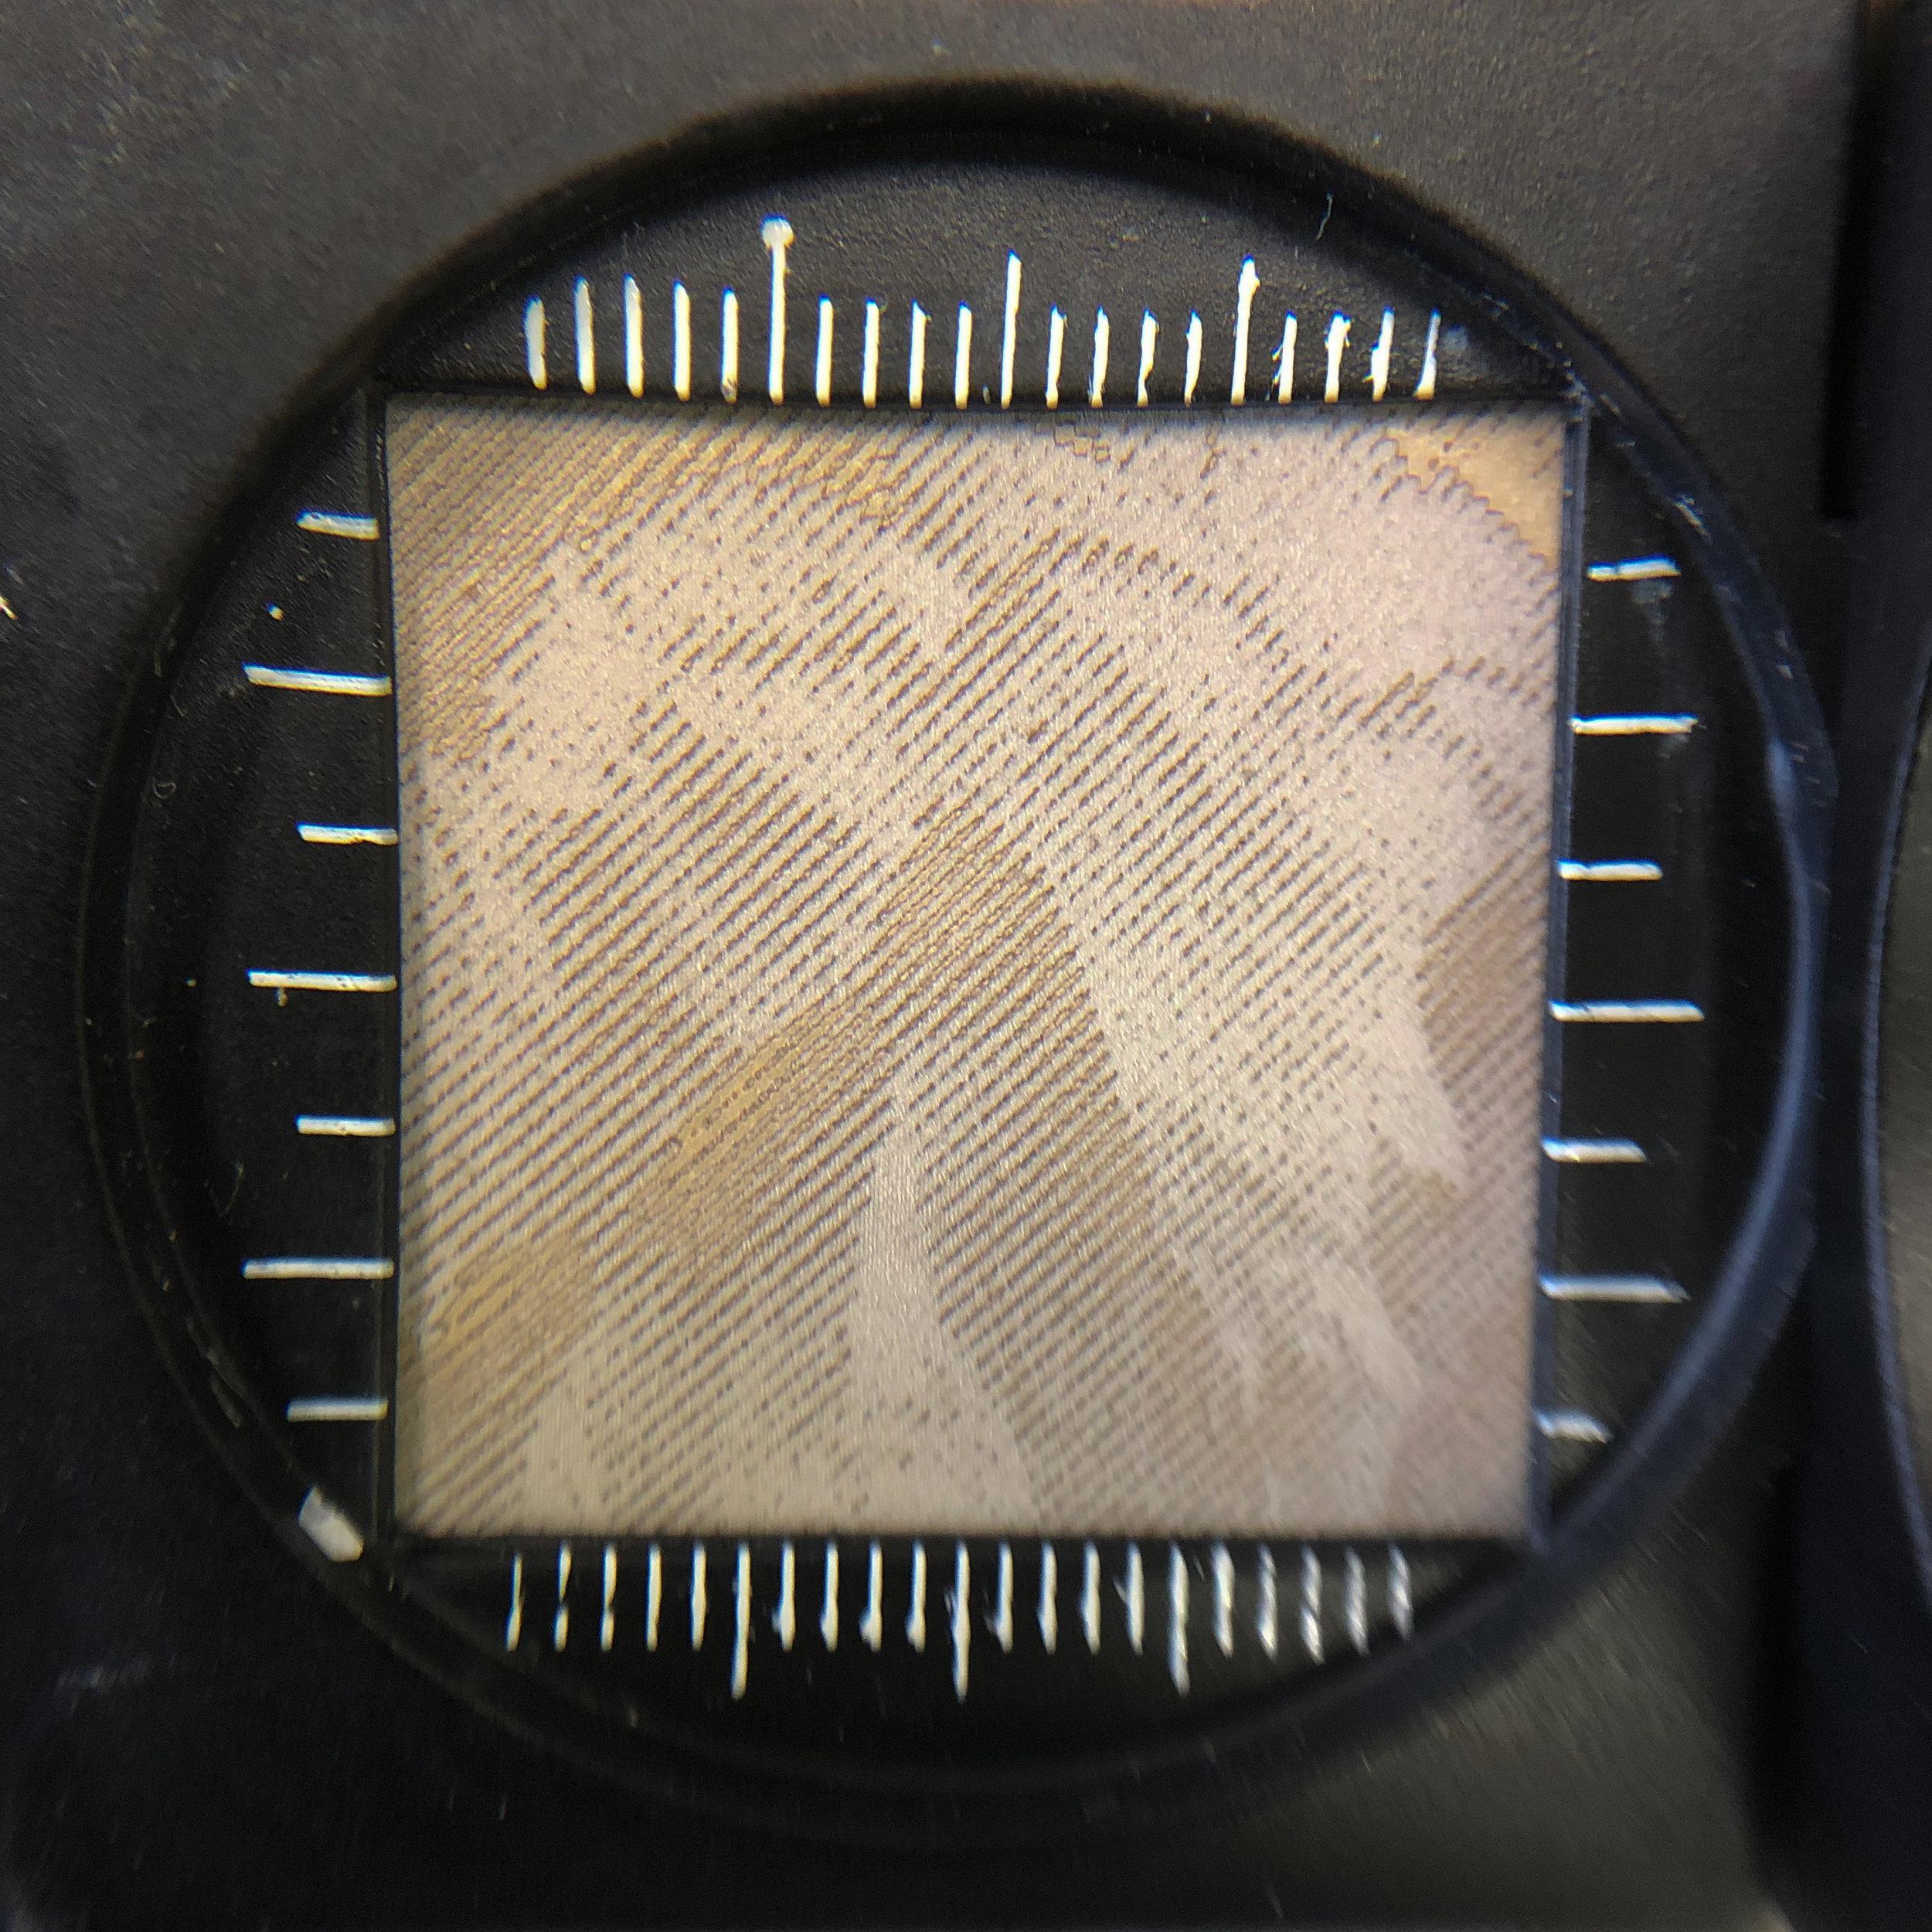 laser engraved stone under magnification